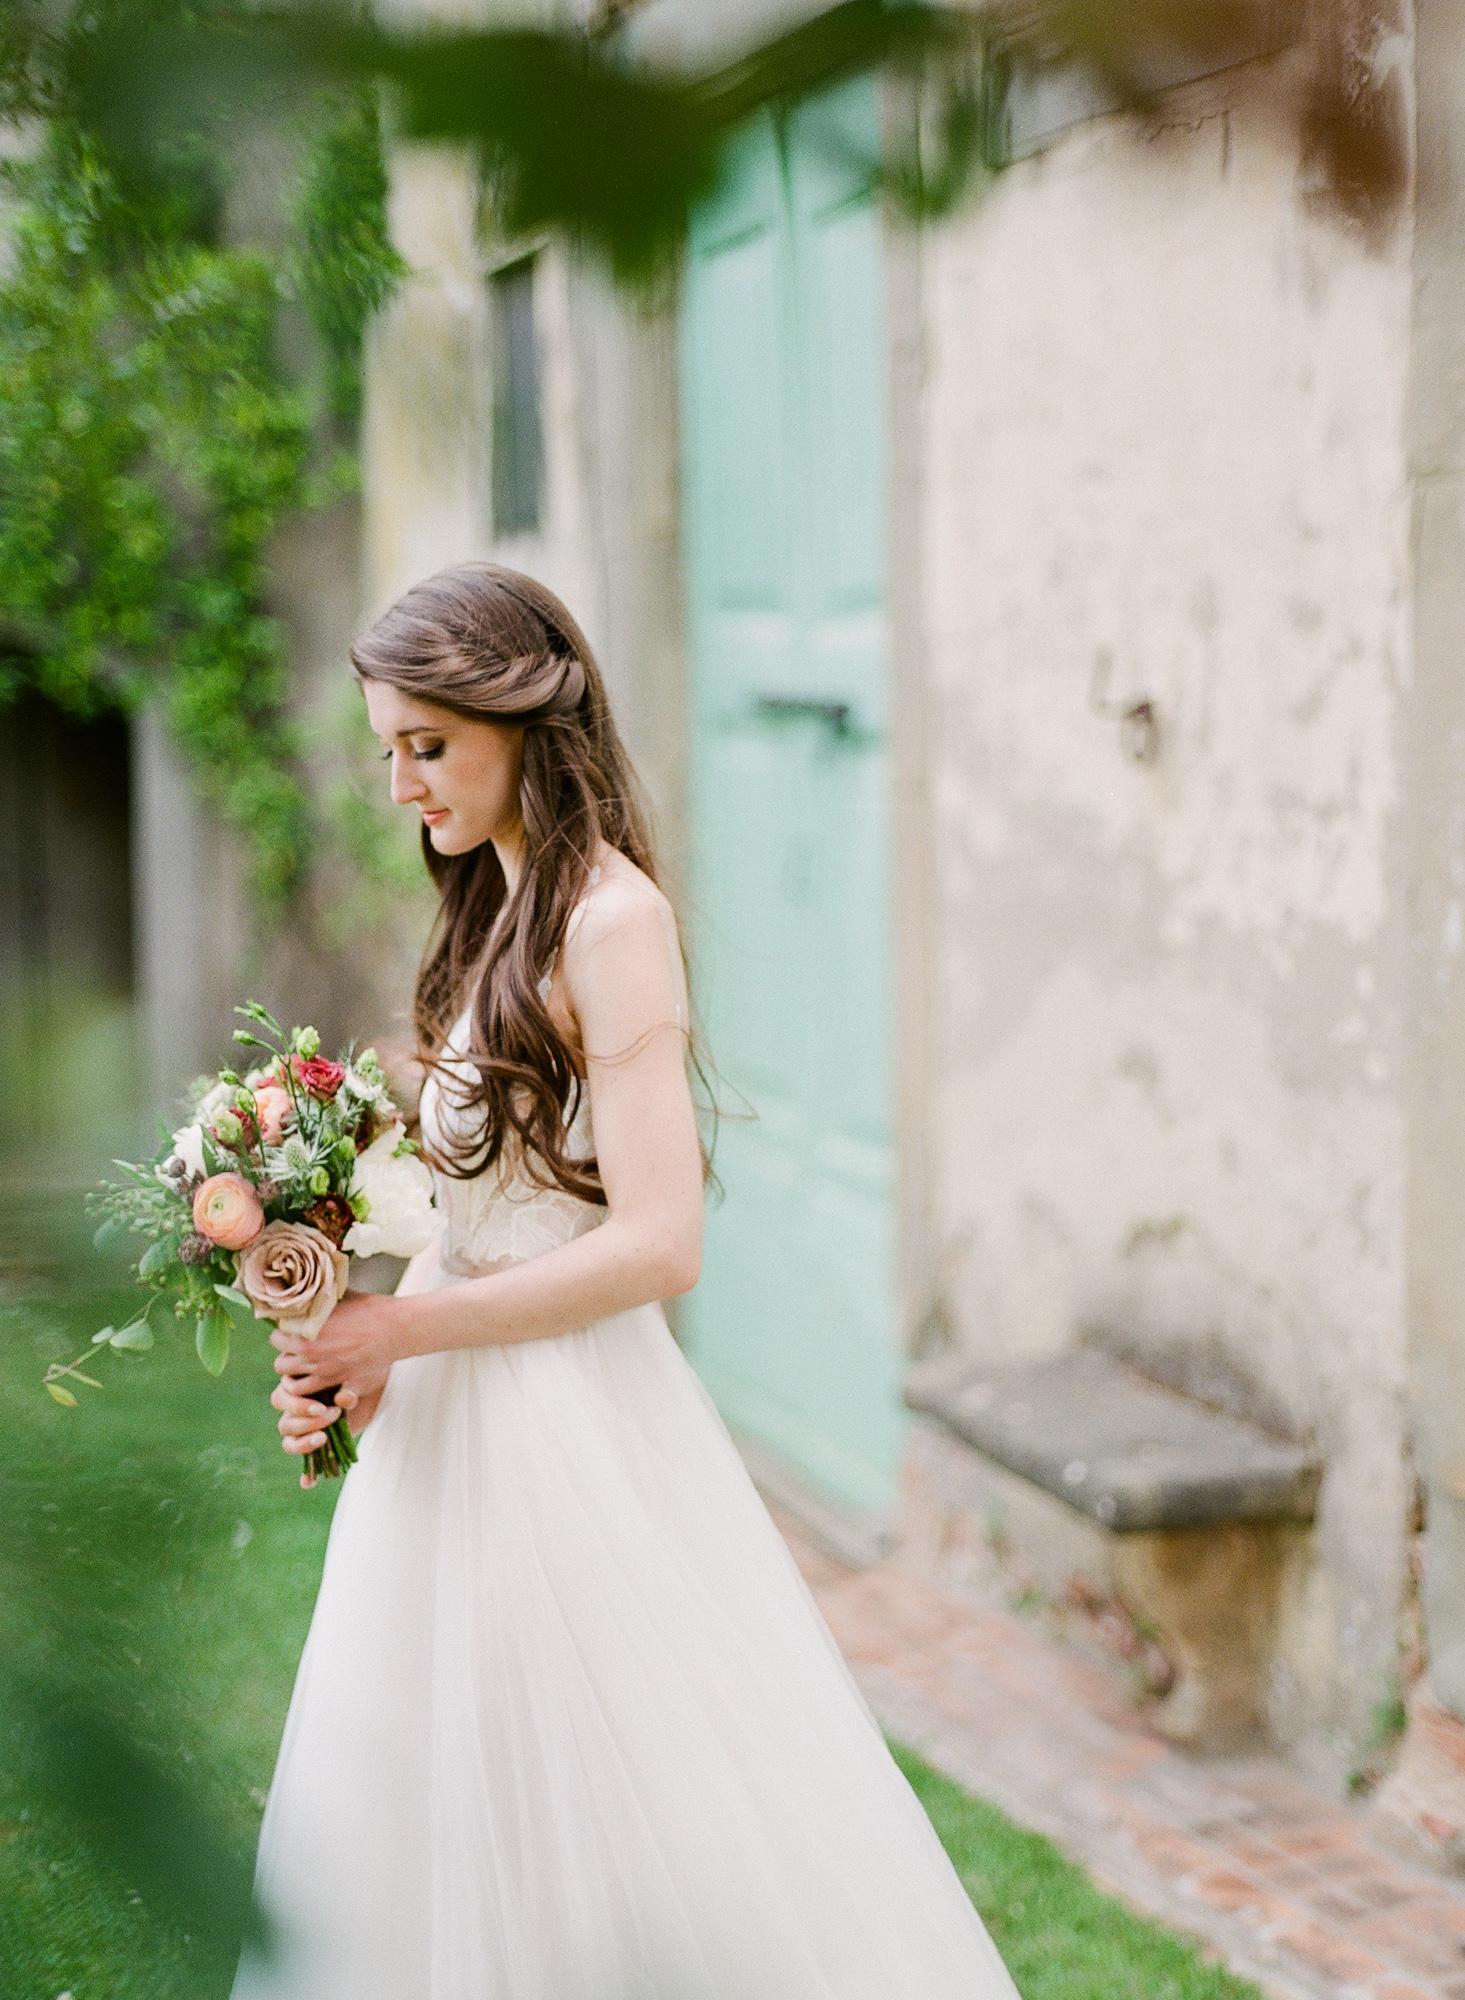 Tuscany-Wedding-Venues-08.jpg